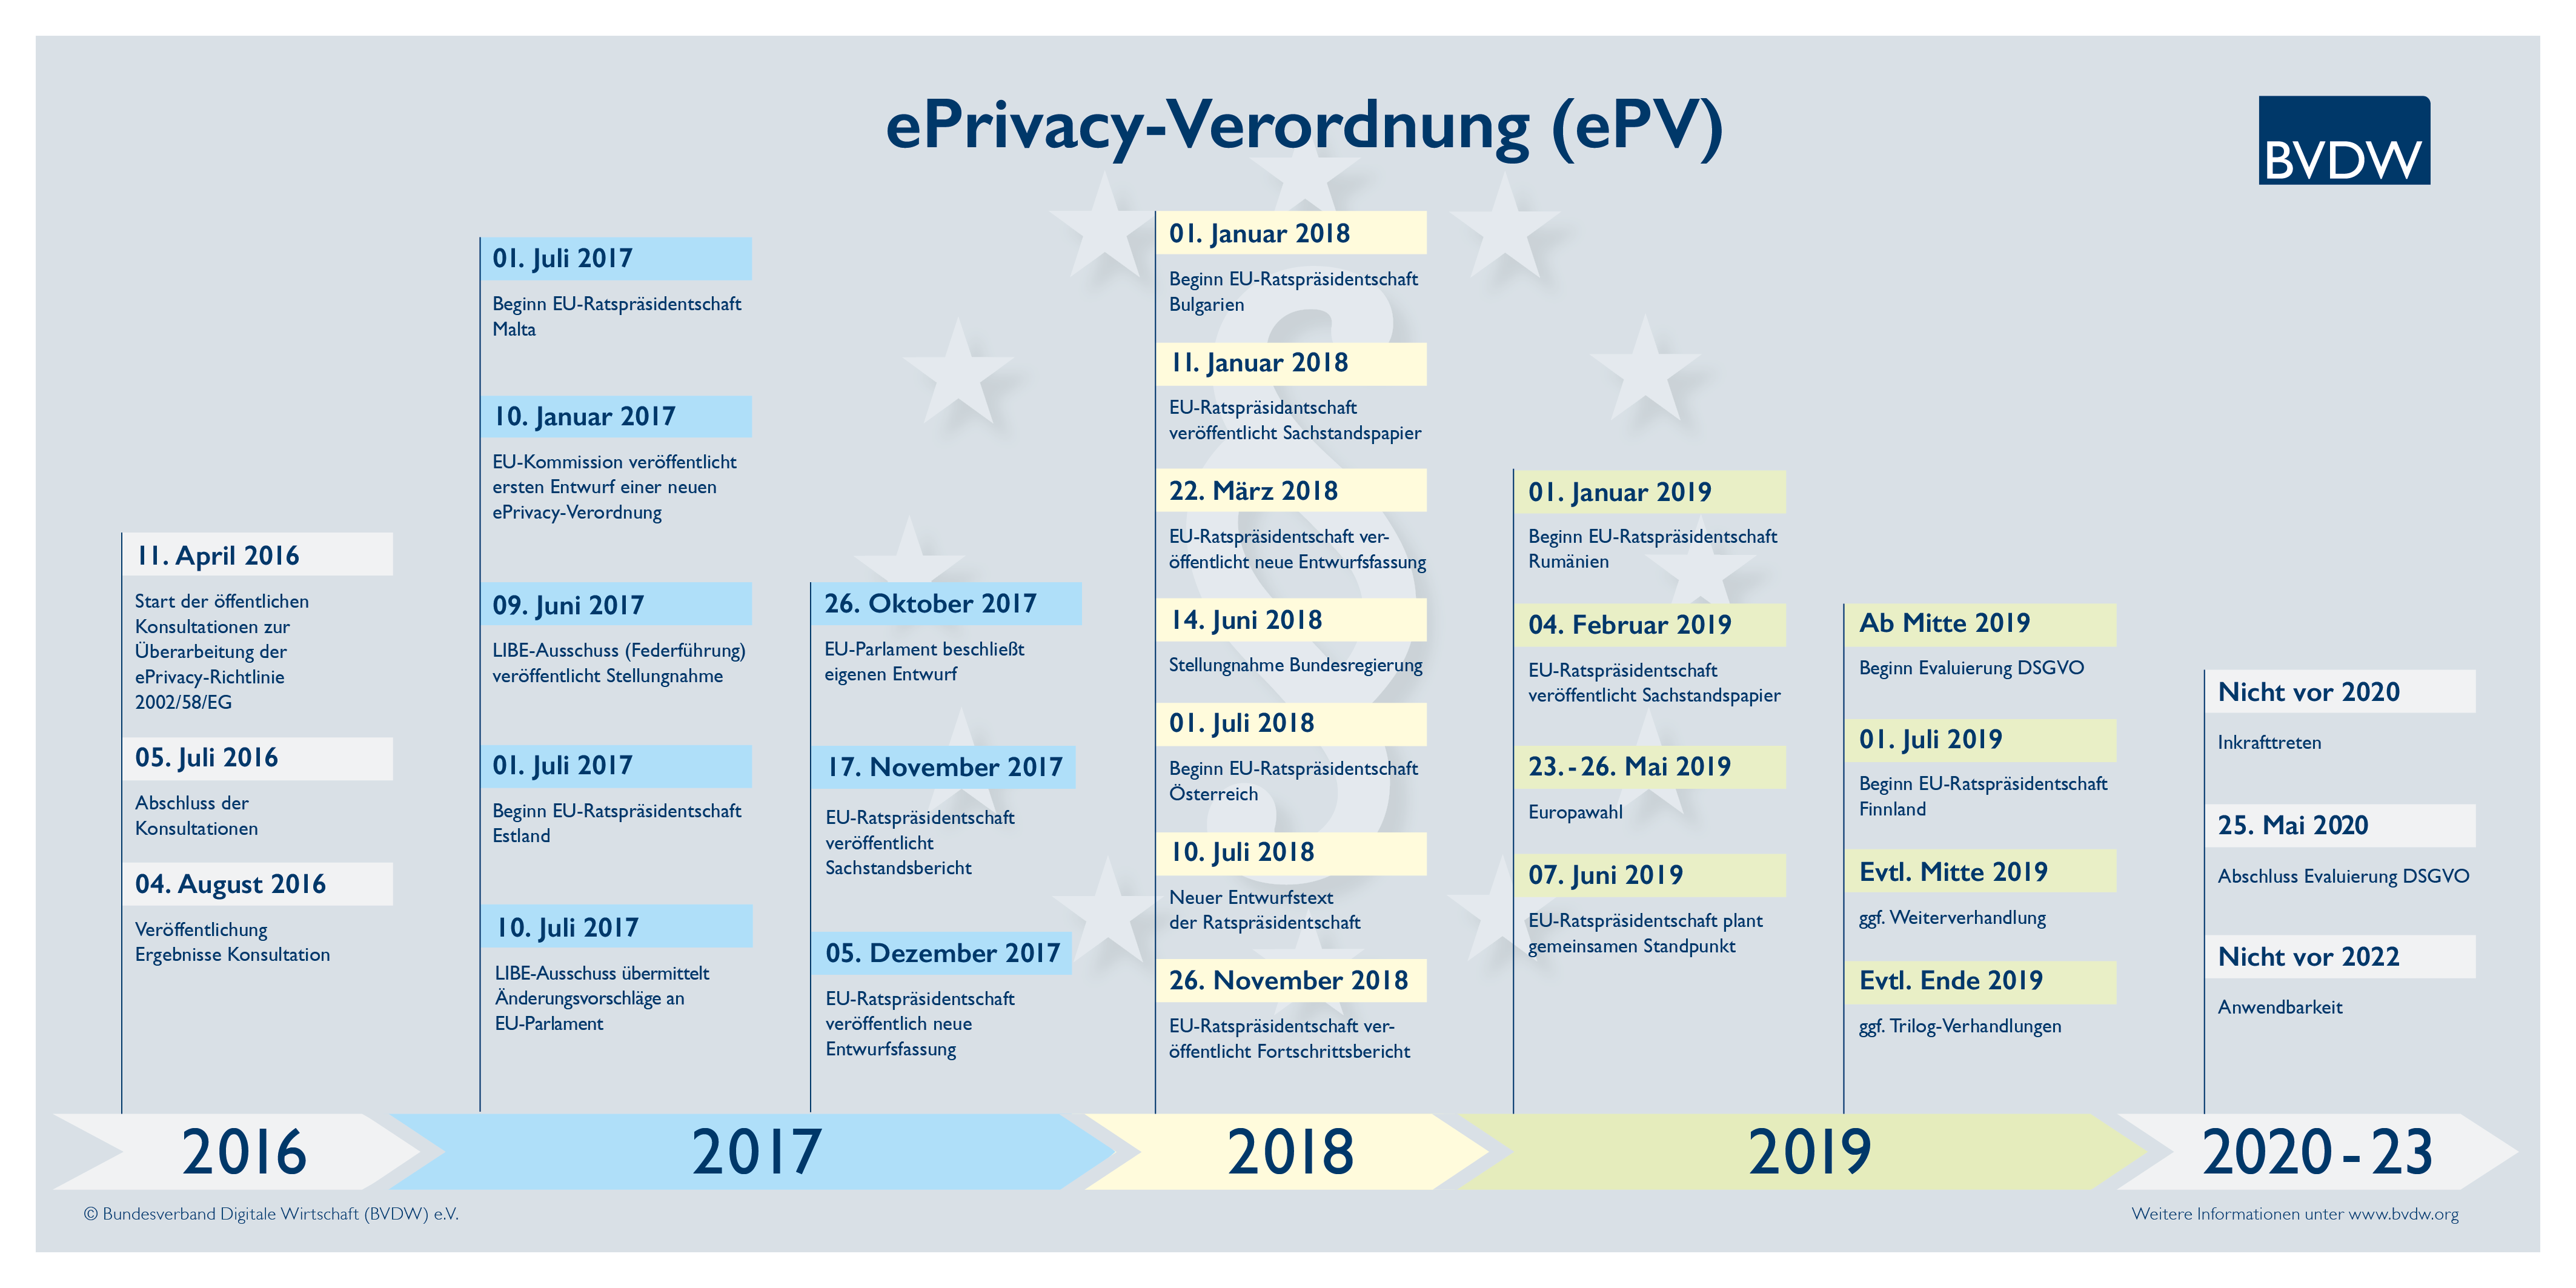 telemediengesetz tmg ebook stand 24 februar 2018 german edition